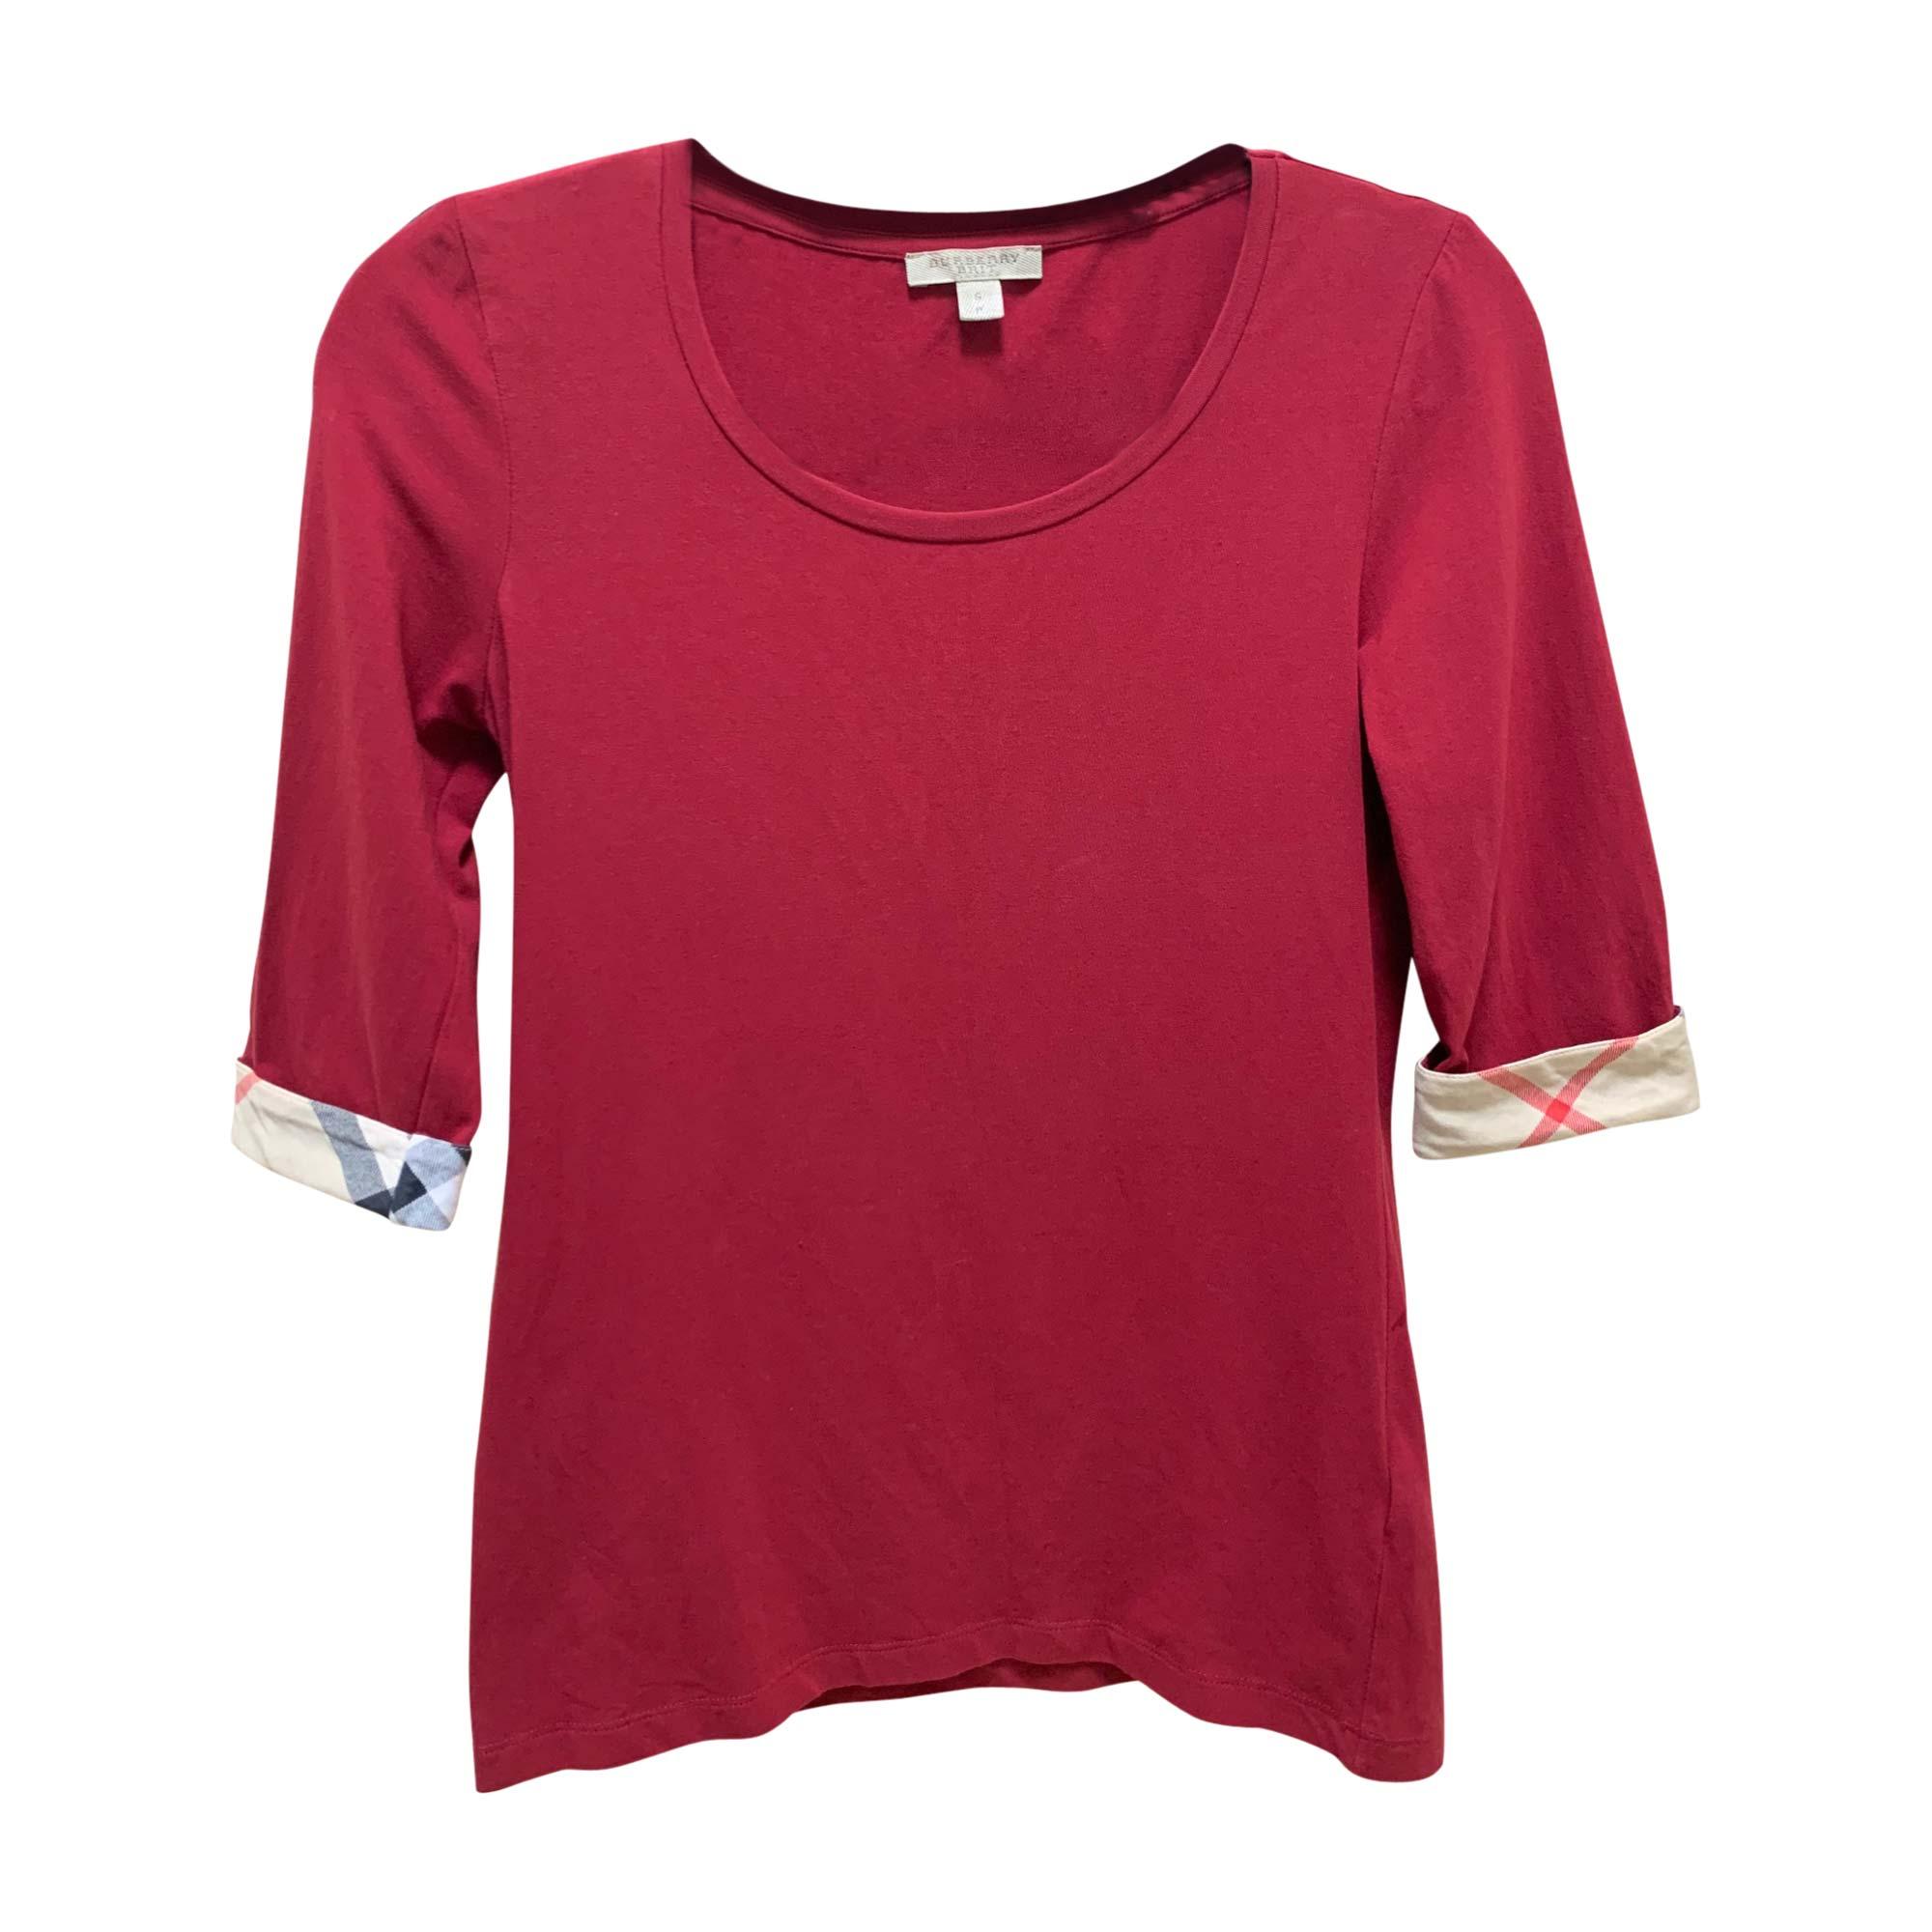 Top, tee-shirt BURBERRY Rouge, bordeaux